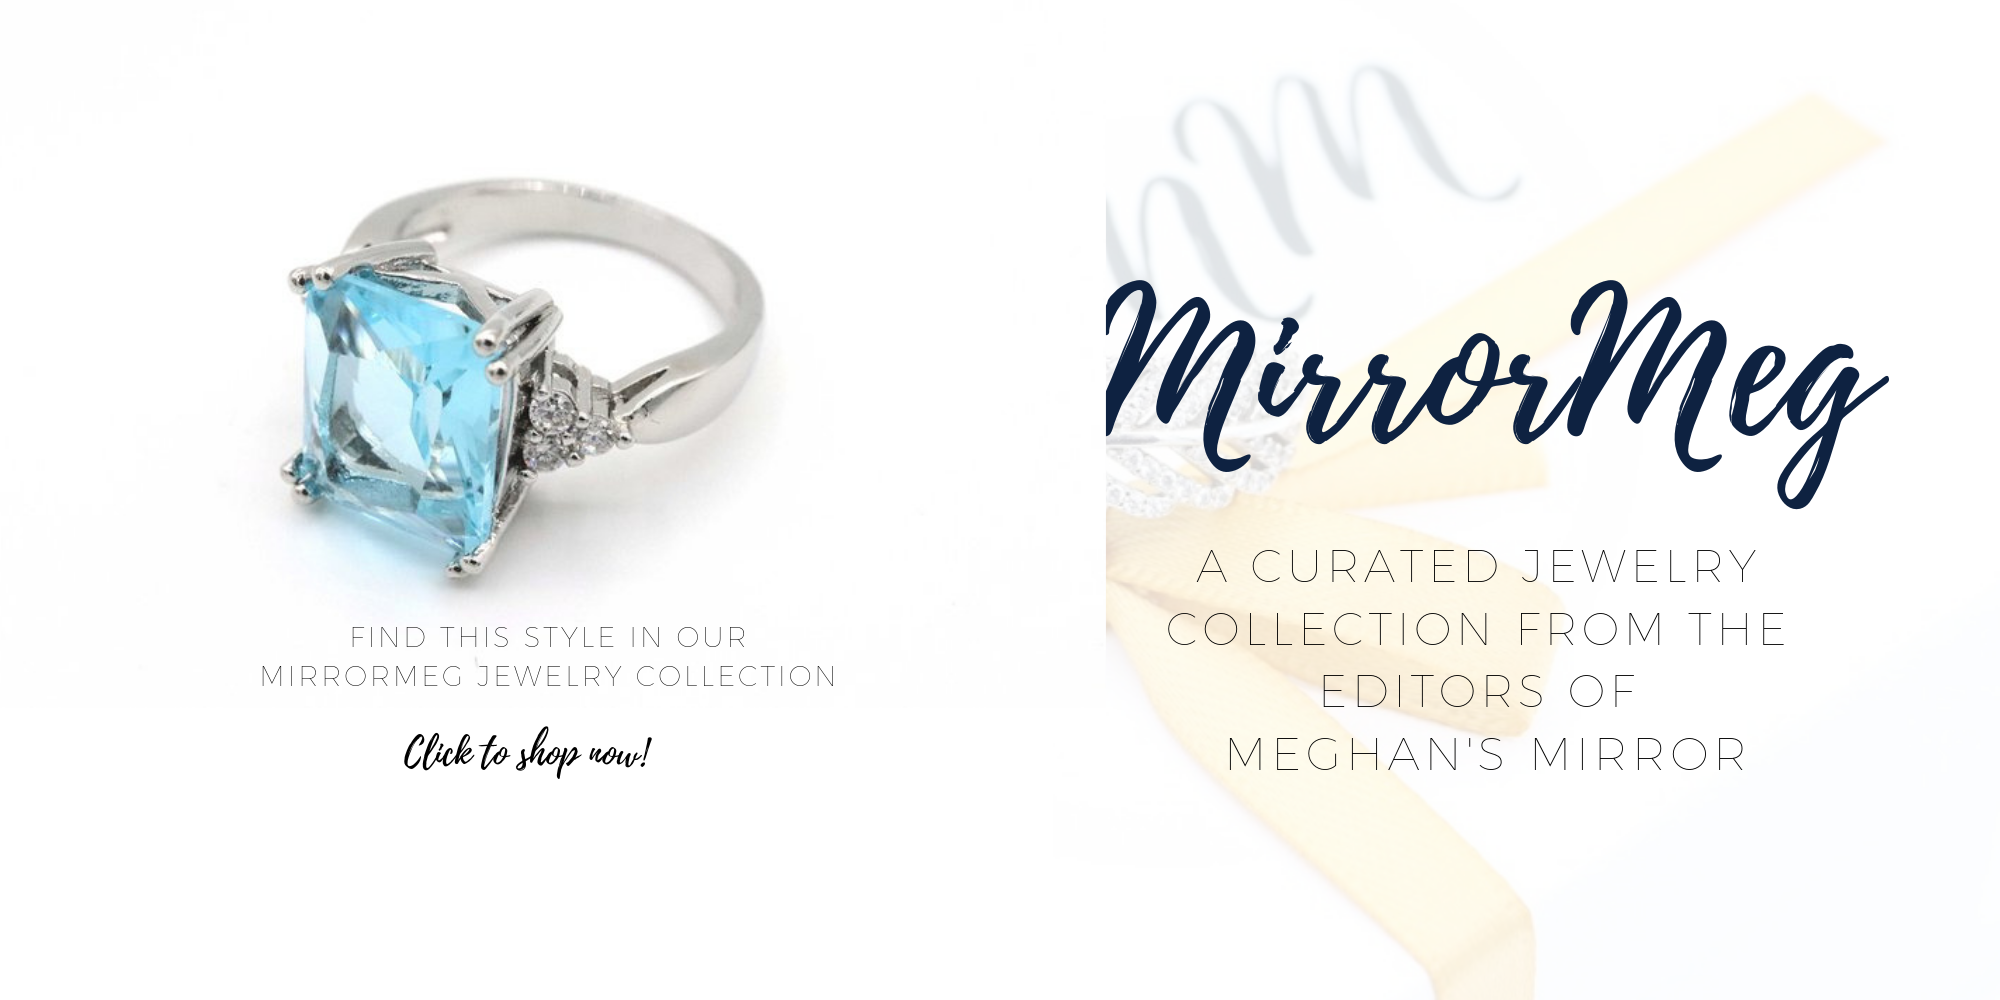 MirrorMeg Aquamarine Ring Meghan Markle Sussex Etsy